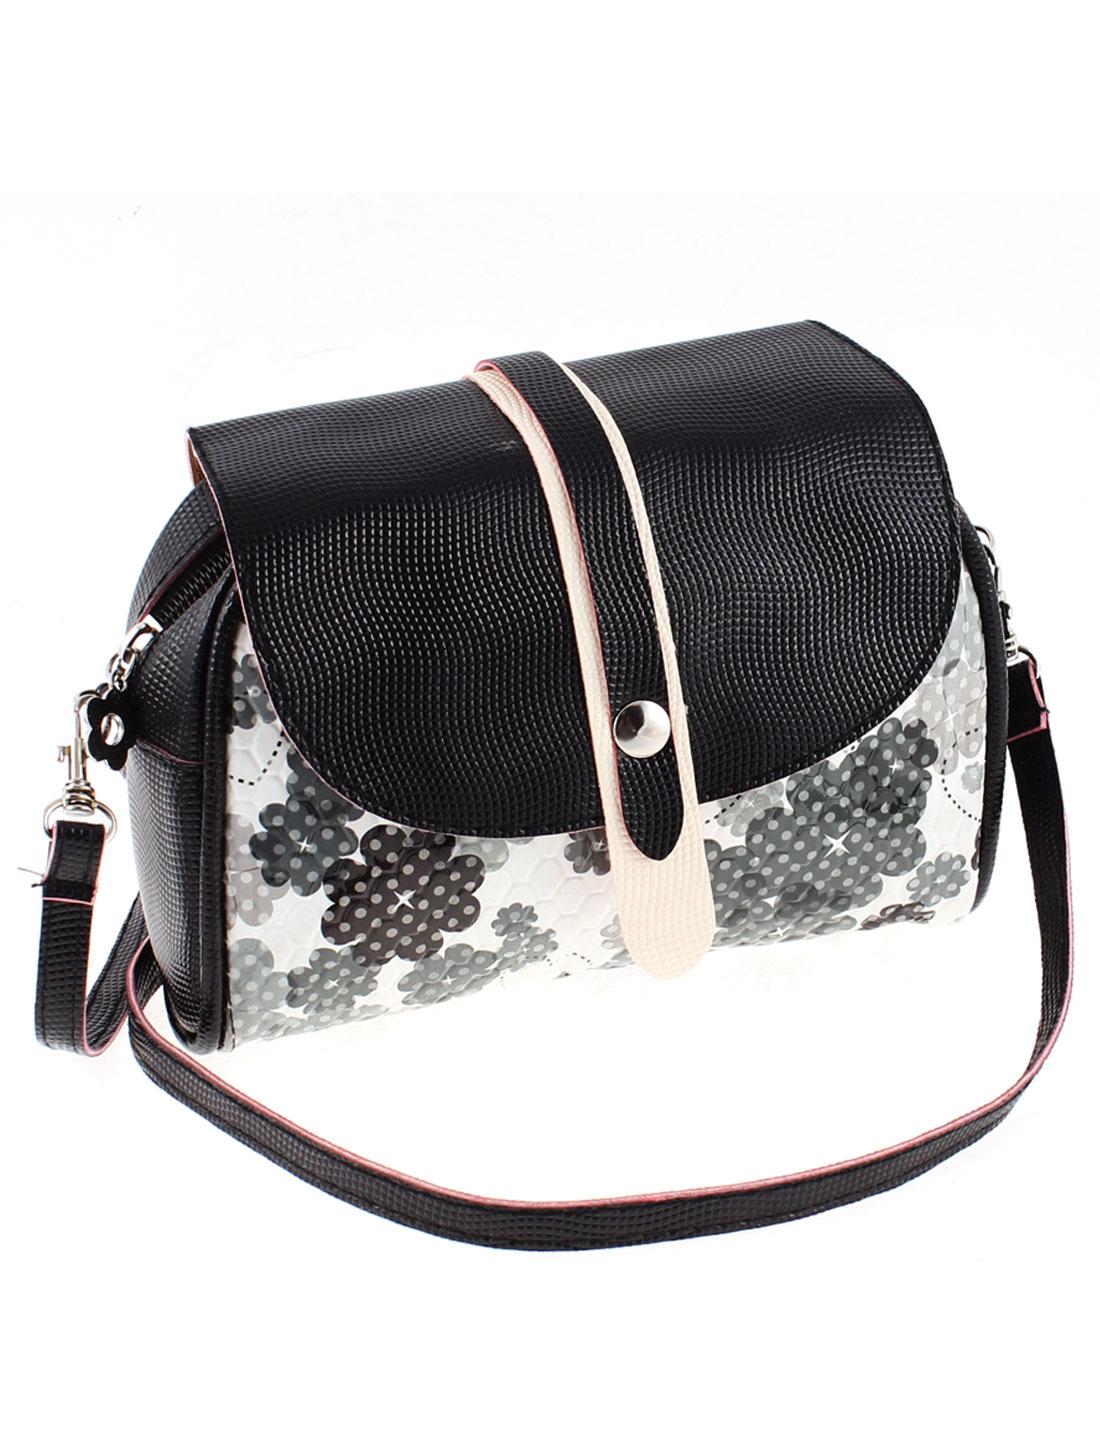 Ladies Girls Faux Leather Shoulder Bag Handbag Purse Black White w Strip